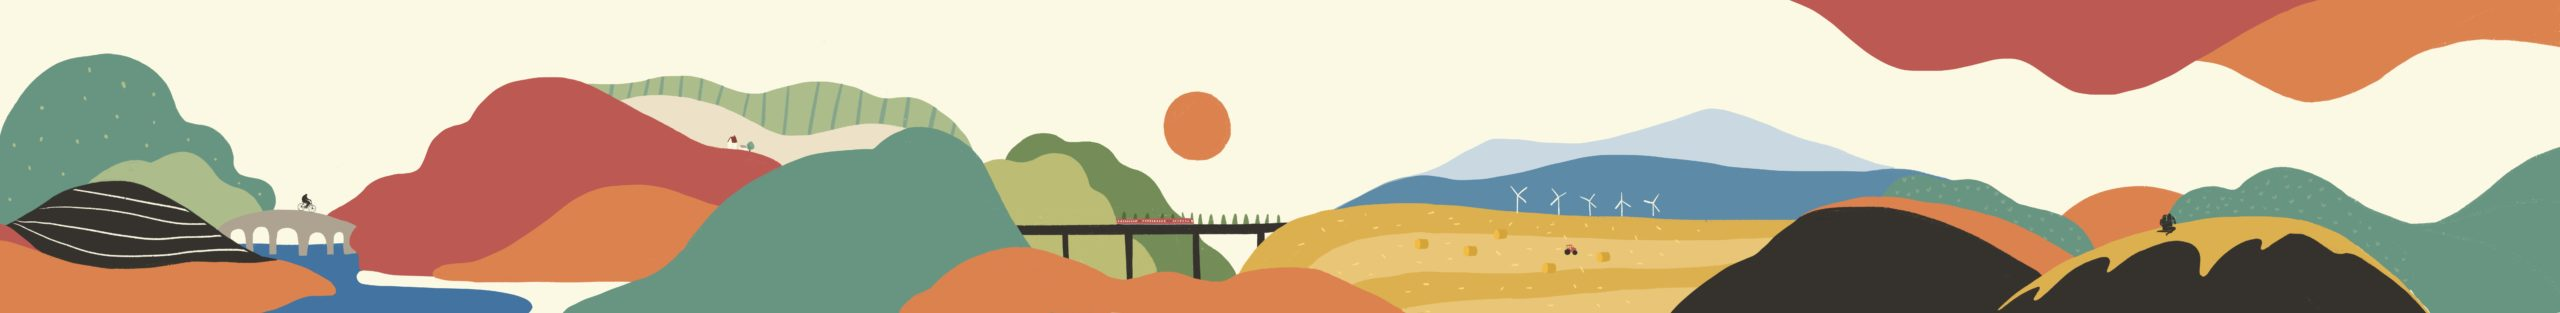 A-Journey_Illustration_02